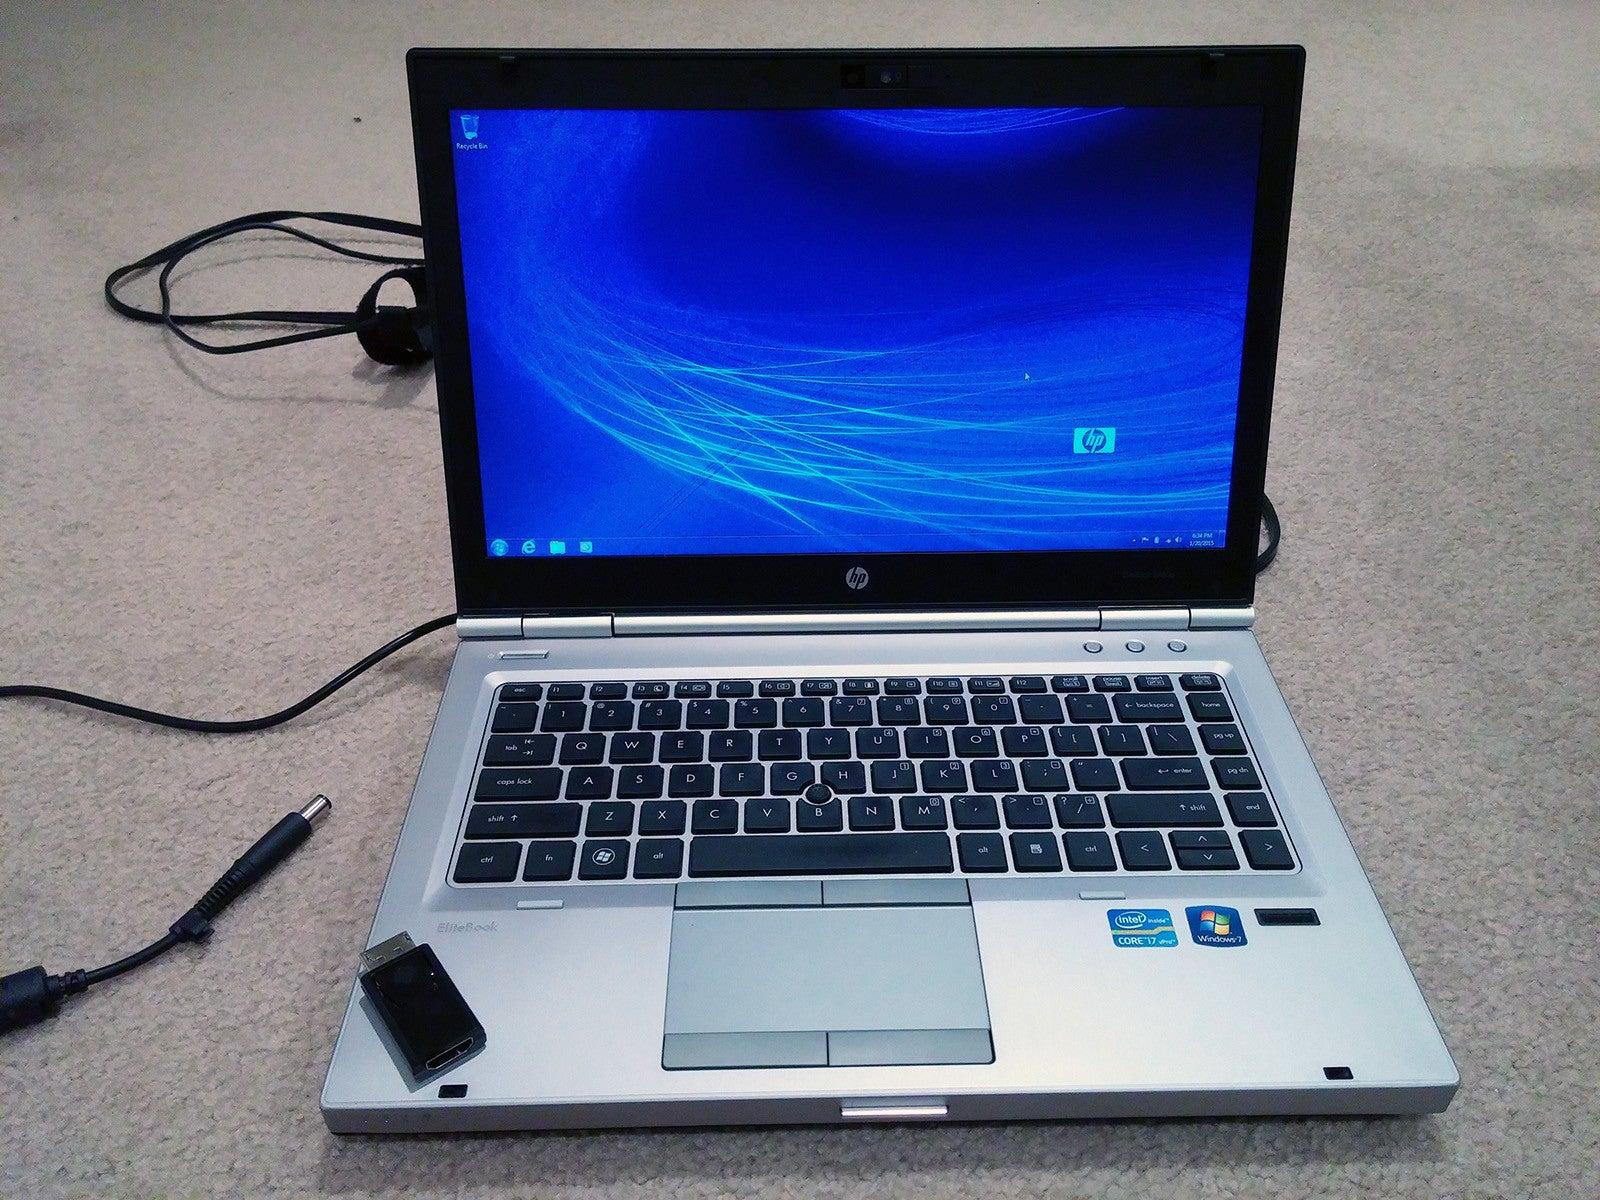 Hp Elitebook 8460p Webcam Drivers Windows 10 - Download For